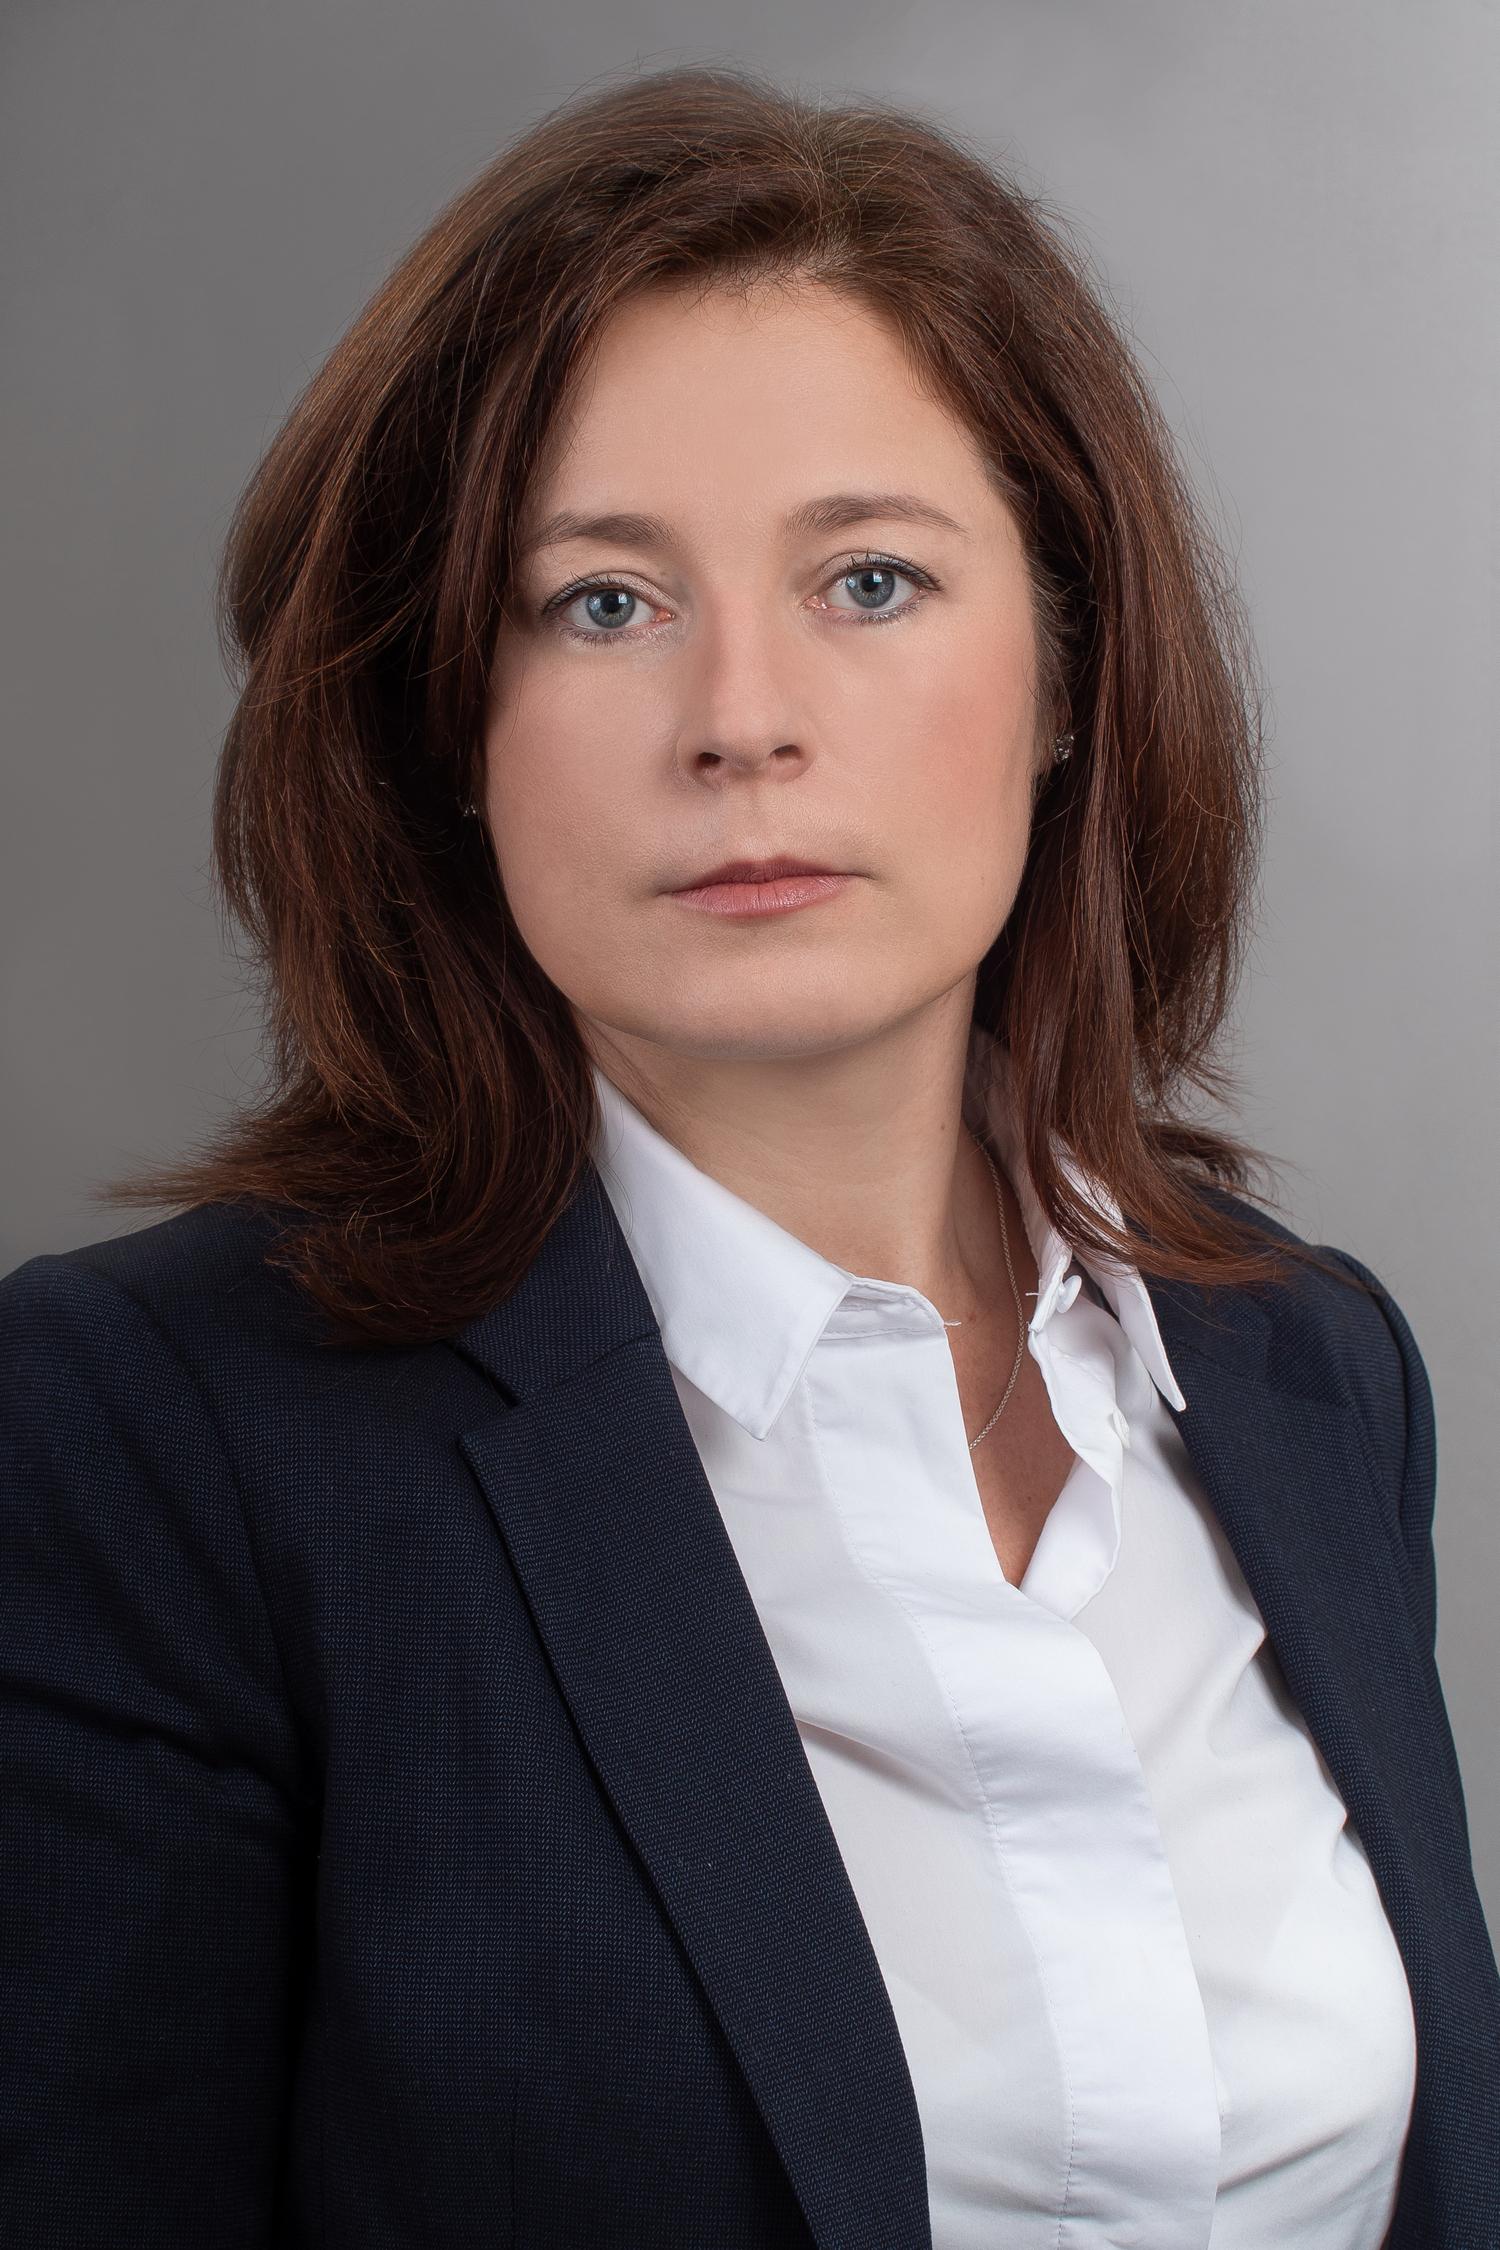 Mónika Miklós